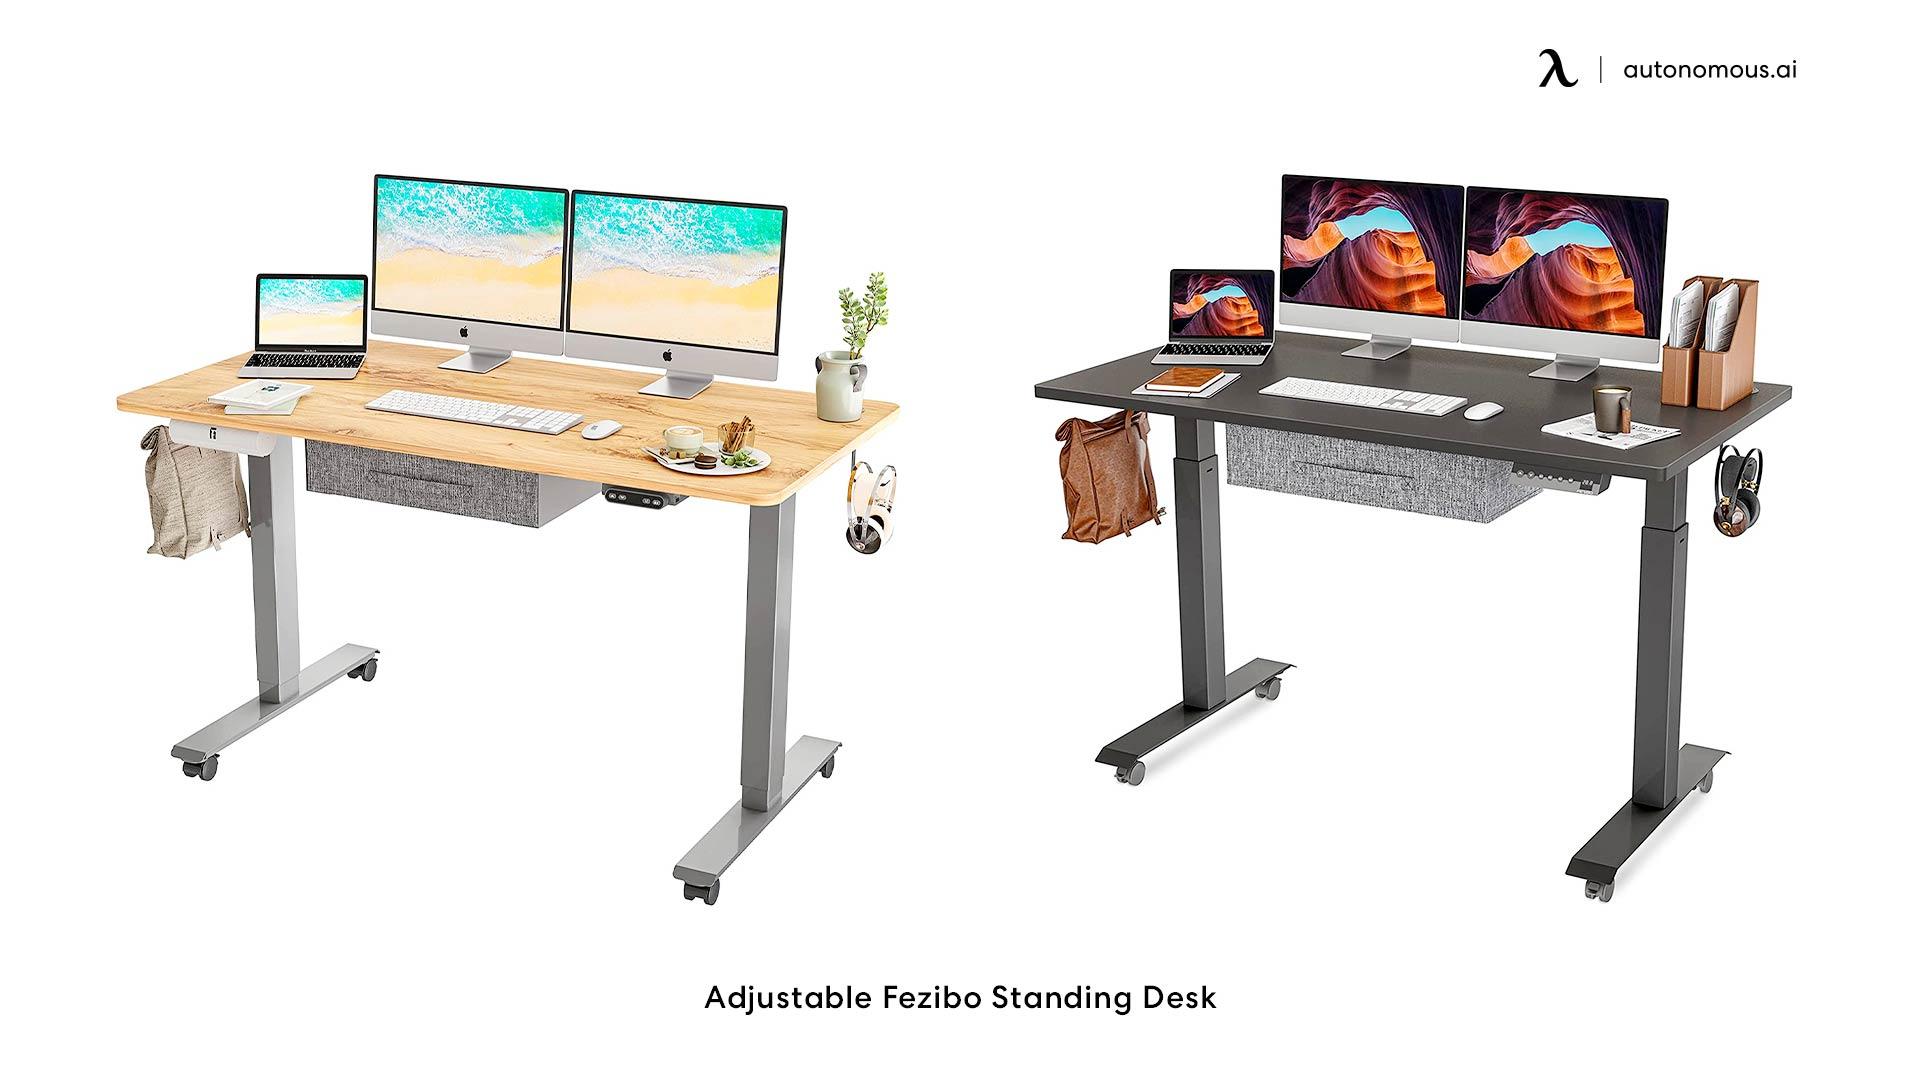 Adjustable Fezibo Standing Desk